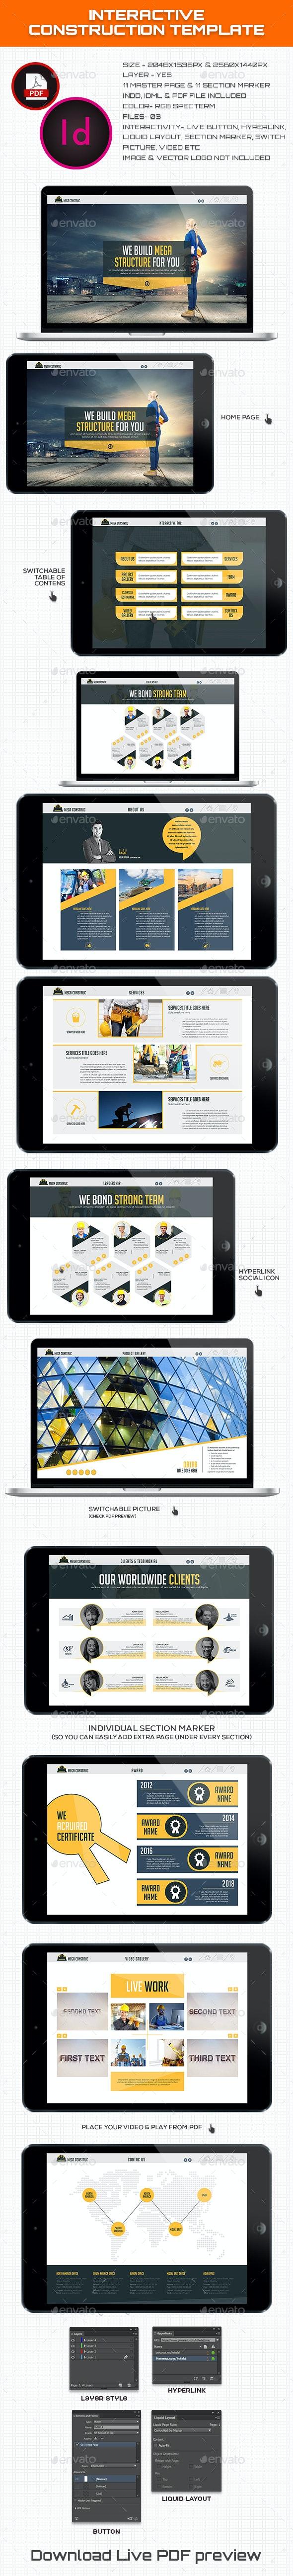 Interactive Construction Template - Digital Books ePublishing